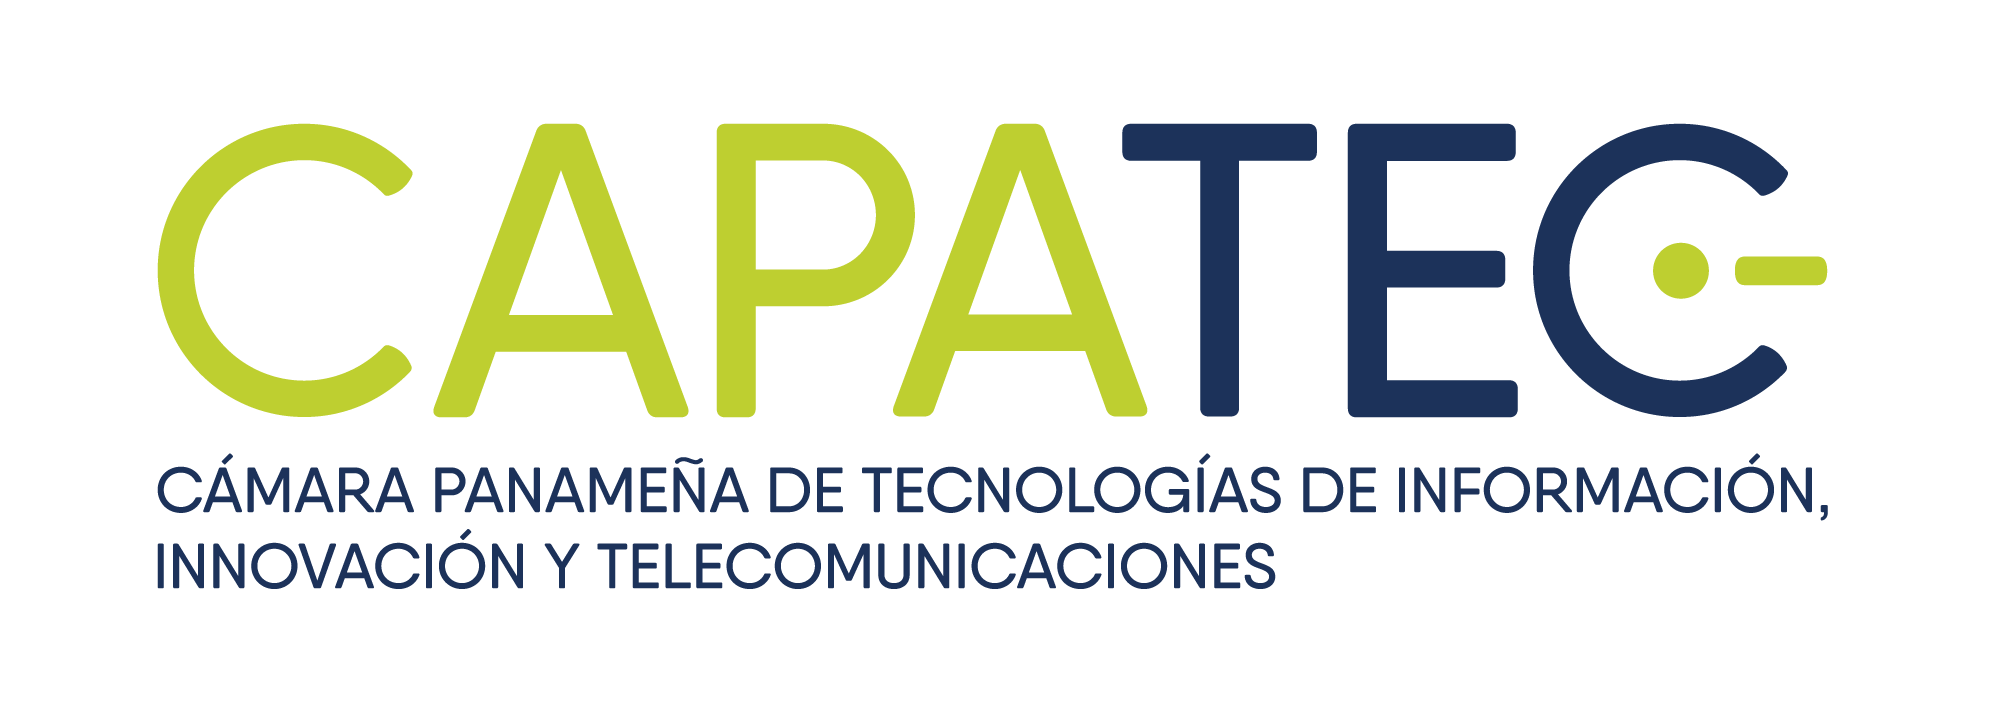 capatec_logo_horizontal